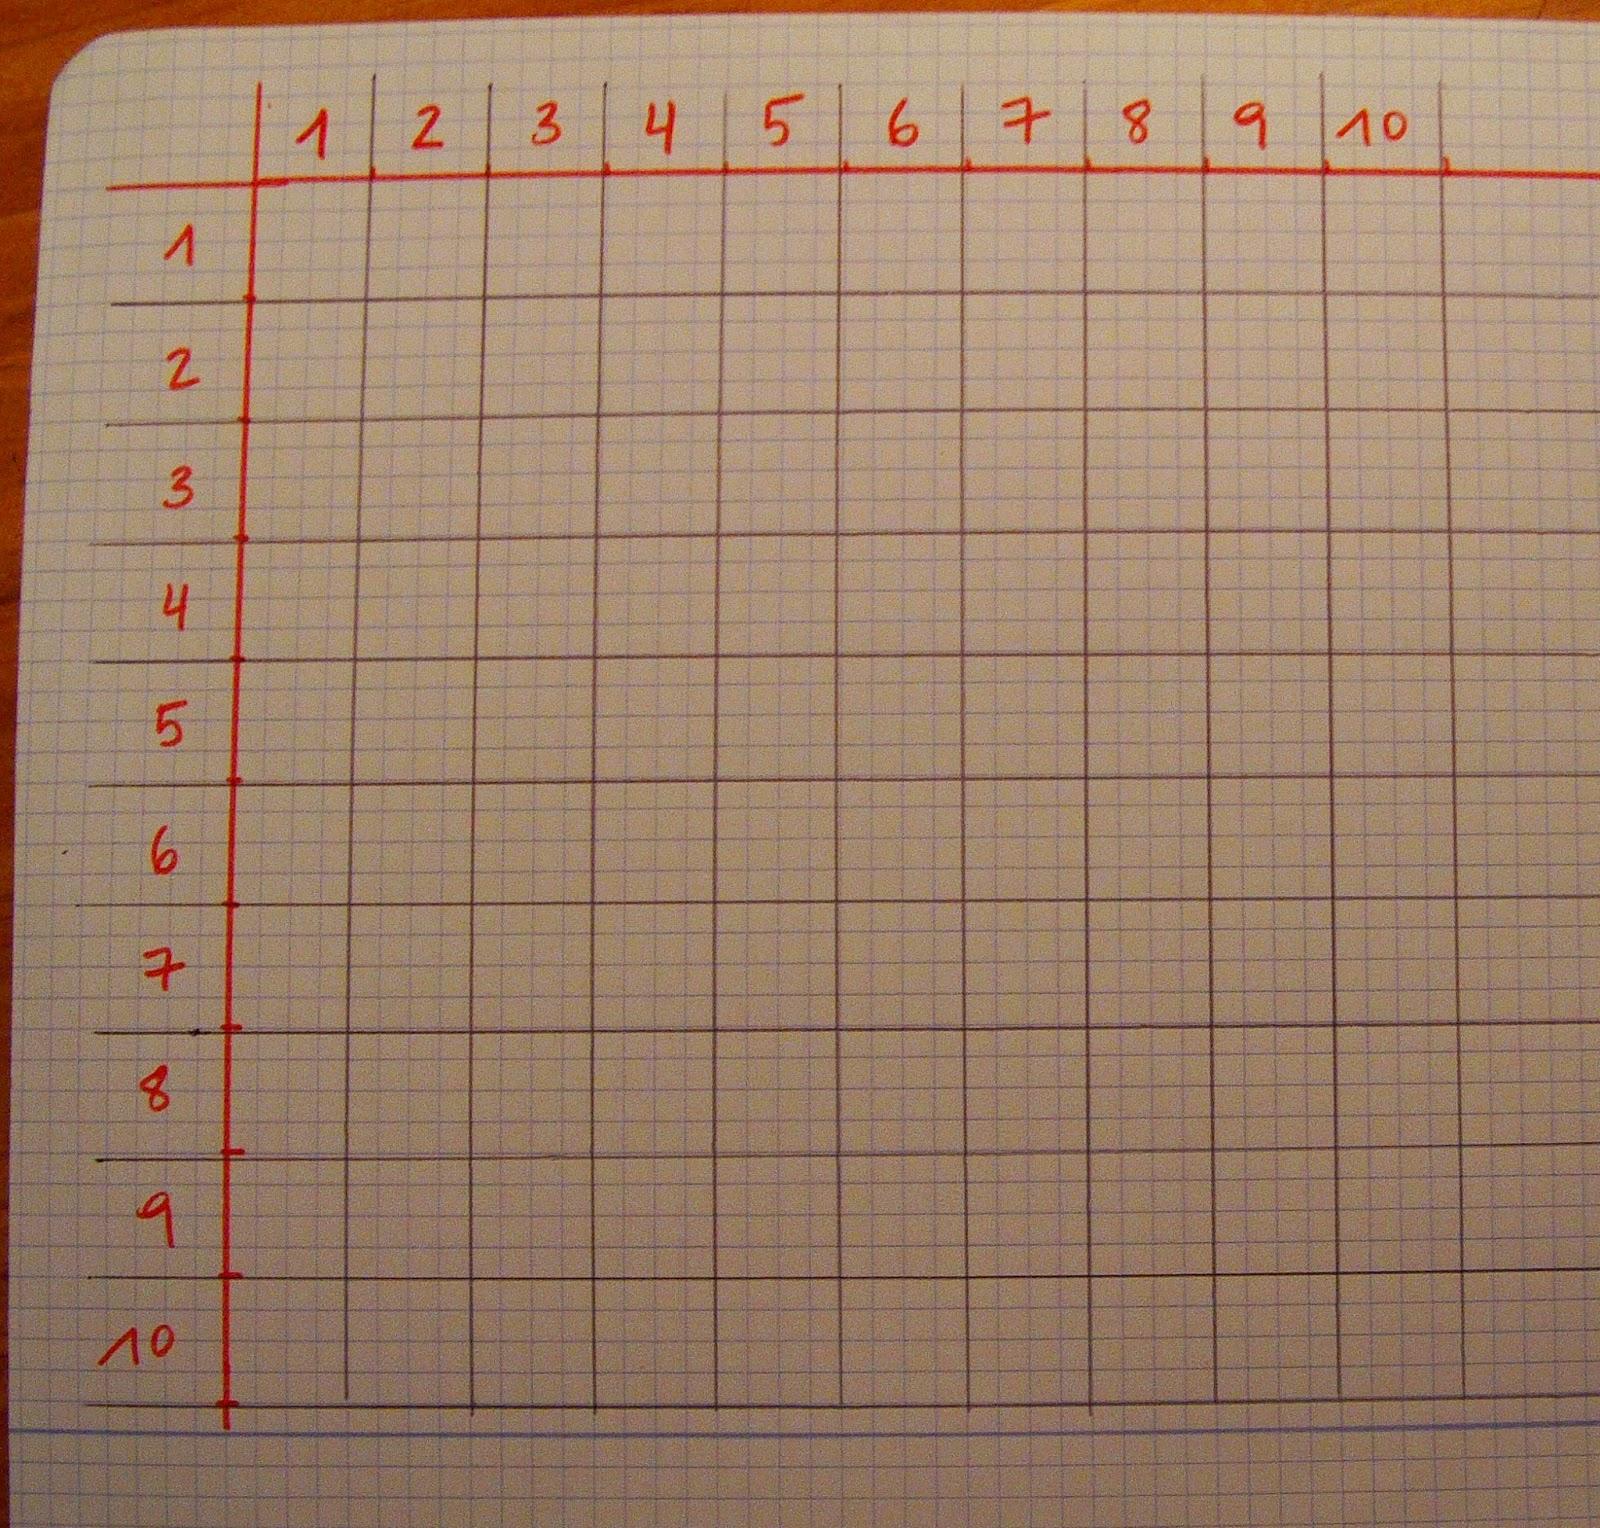 S.O.S. Matemáticas para padres: Tablas de multiplicar: otra forma ...